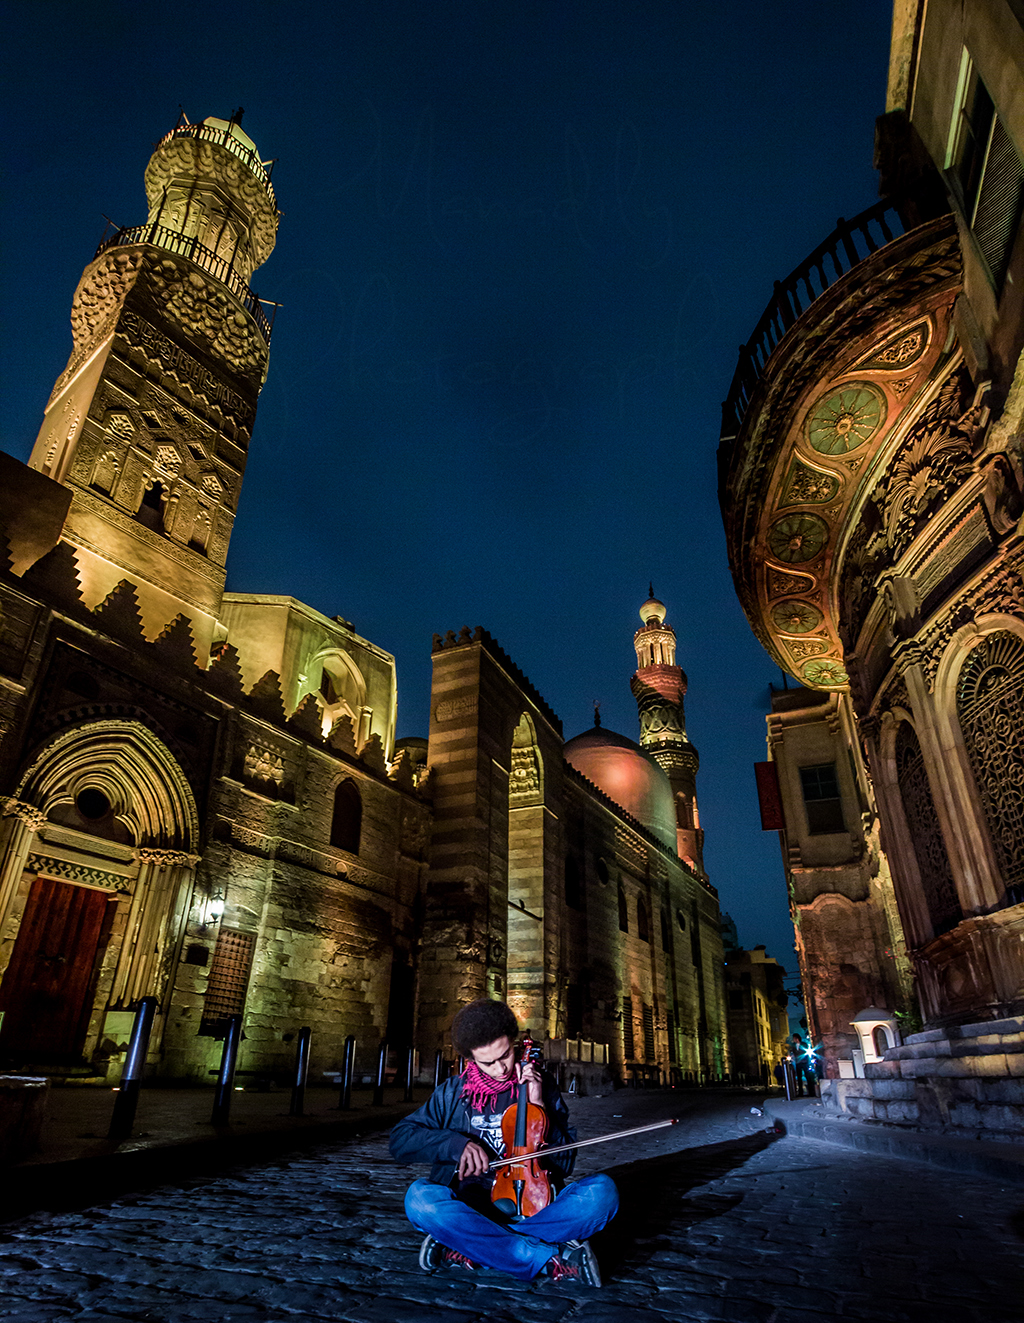 بالصور صور لمصر , اجمل صور ل مصر ام الدنيا 1658 4